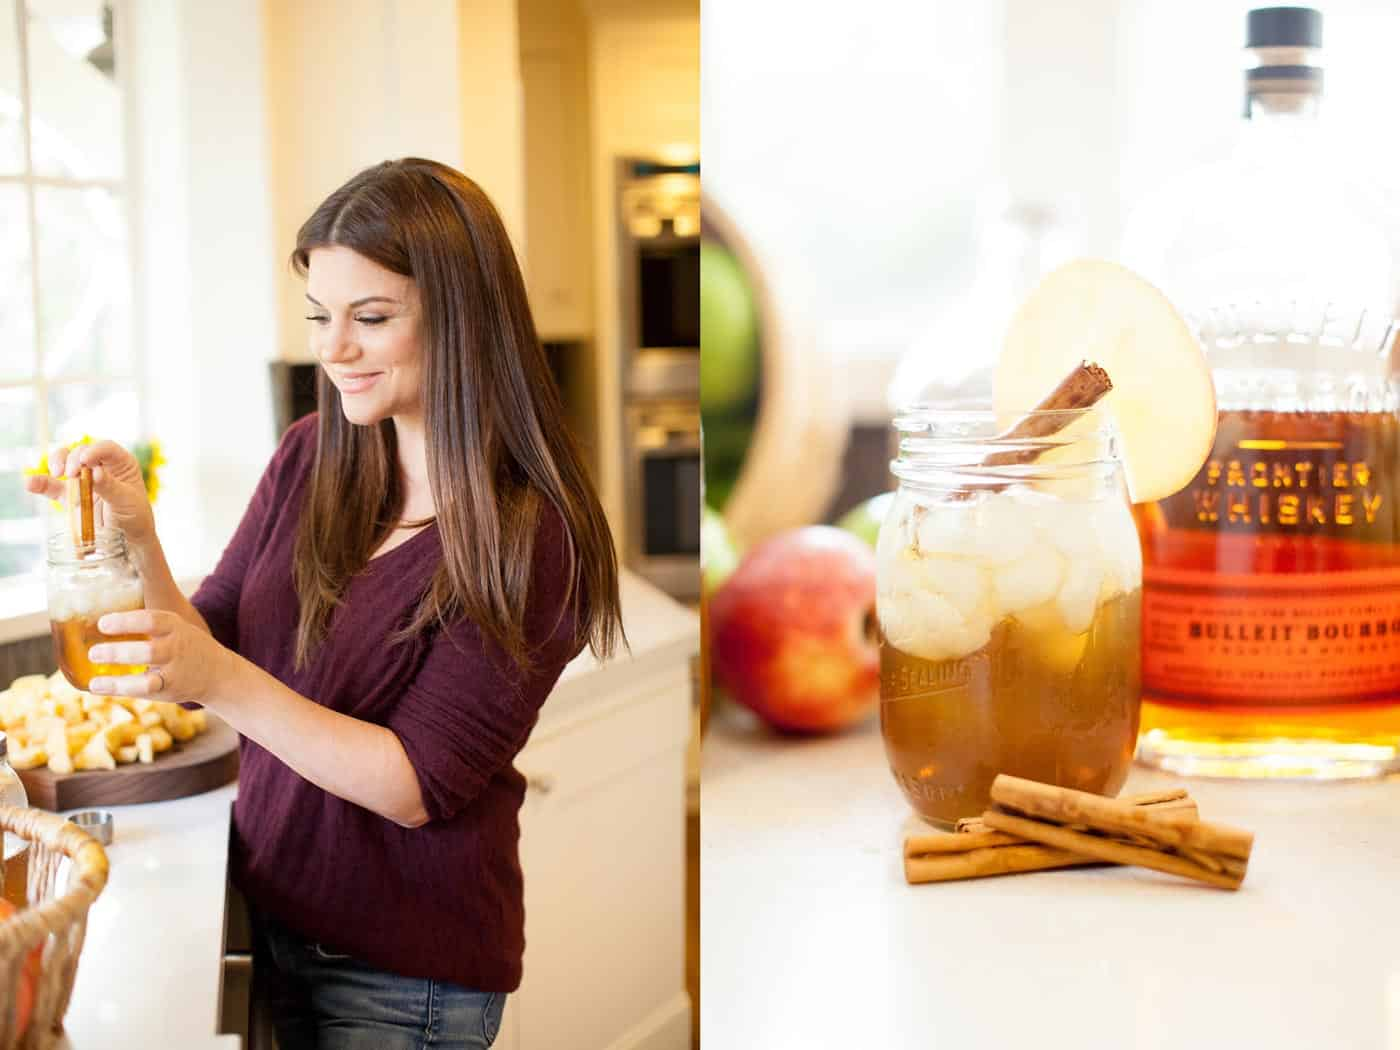 Apple Season Recipes with Tiffani Thiessen • Photos by Morgan Pansing